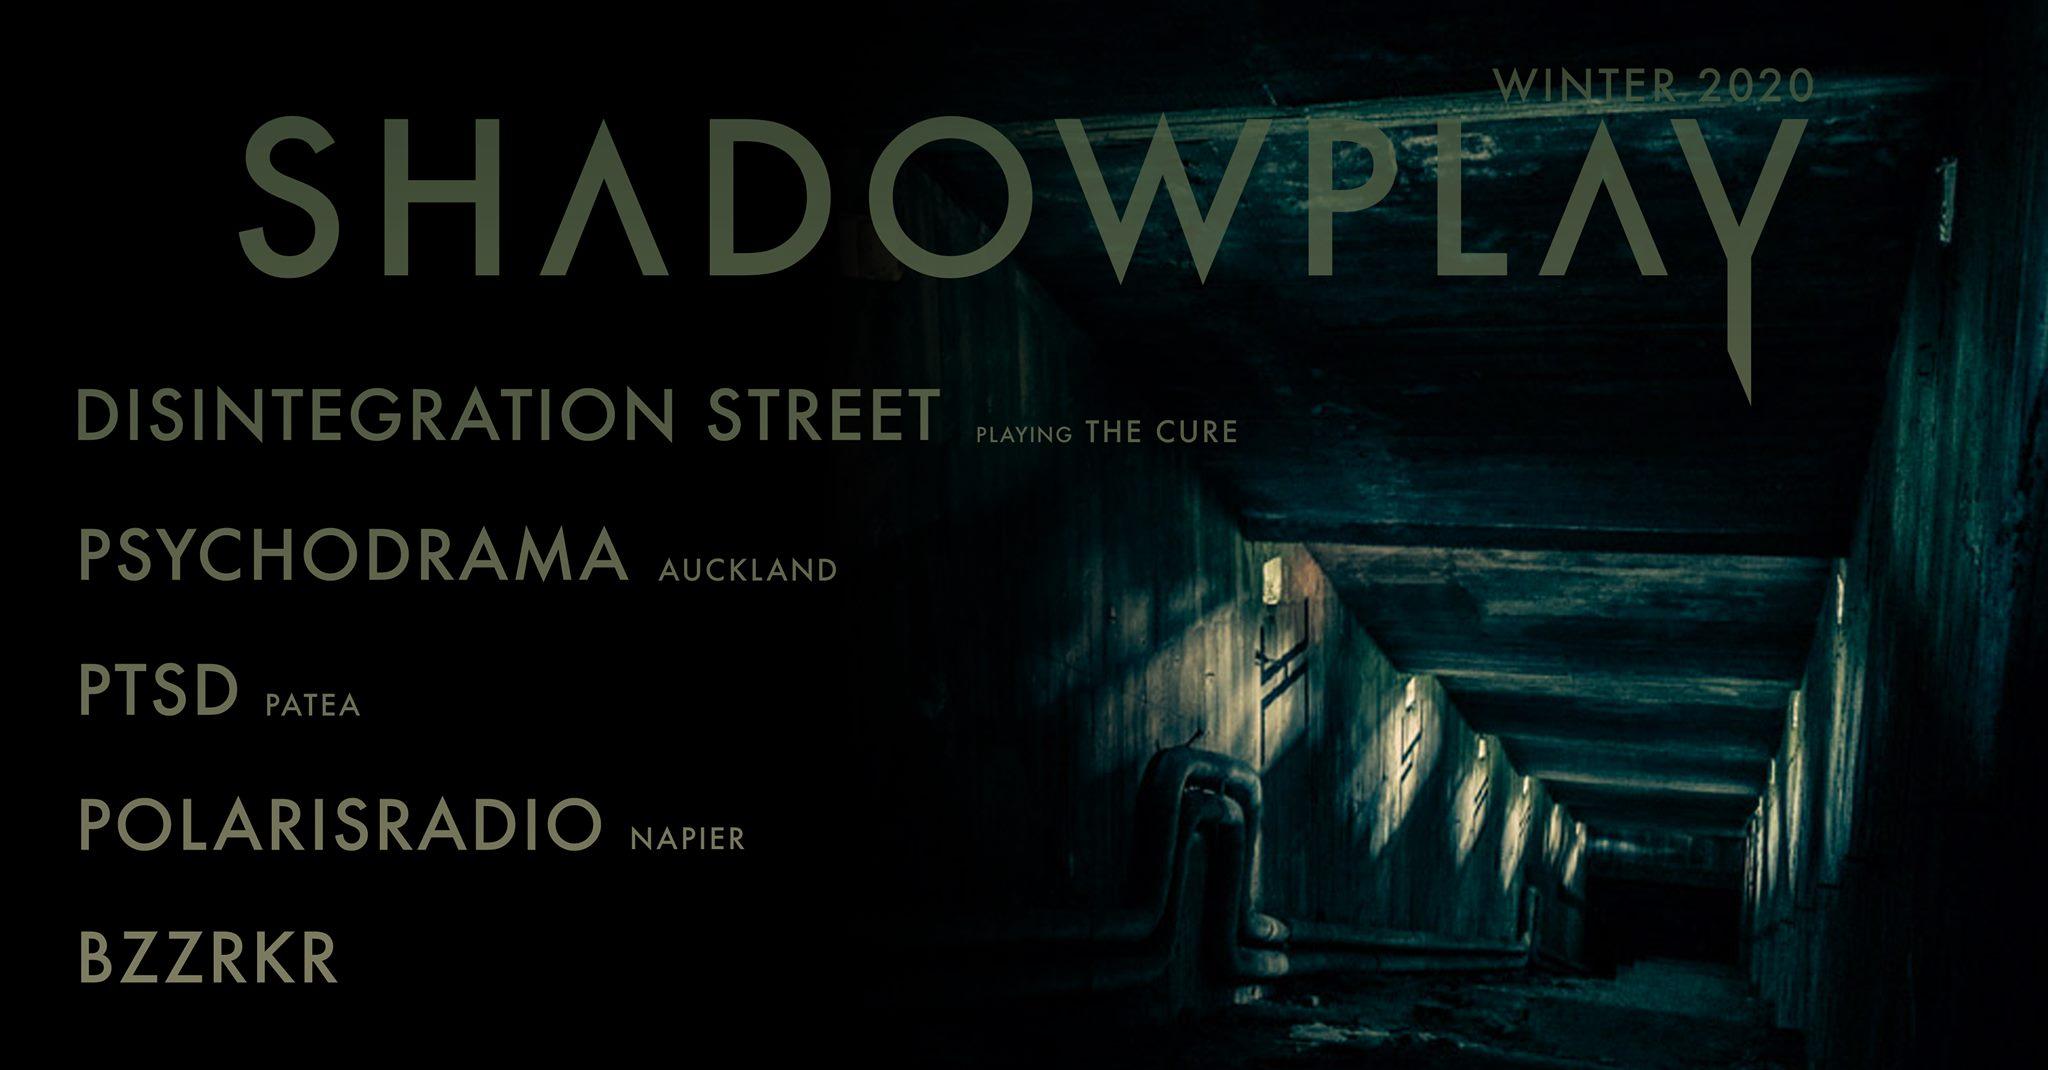 Shadowplay Winter 2020